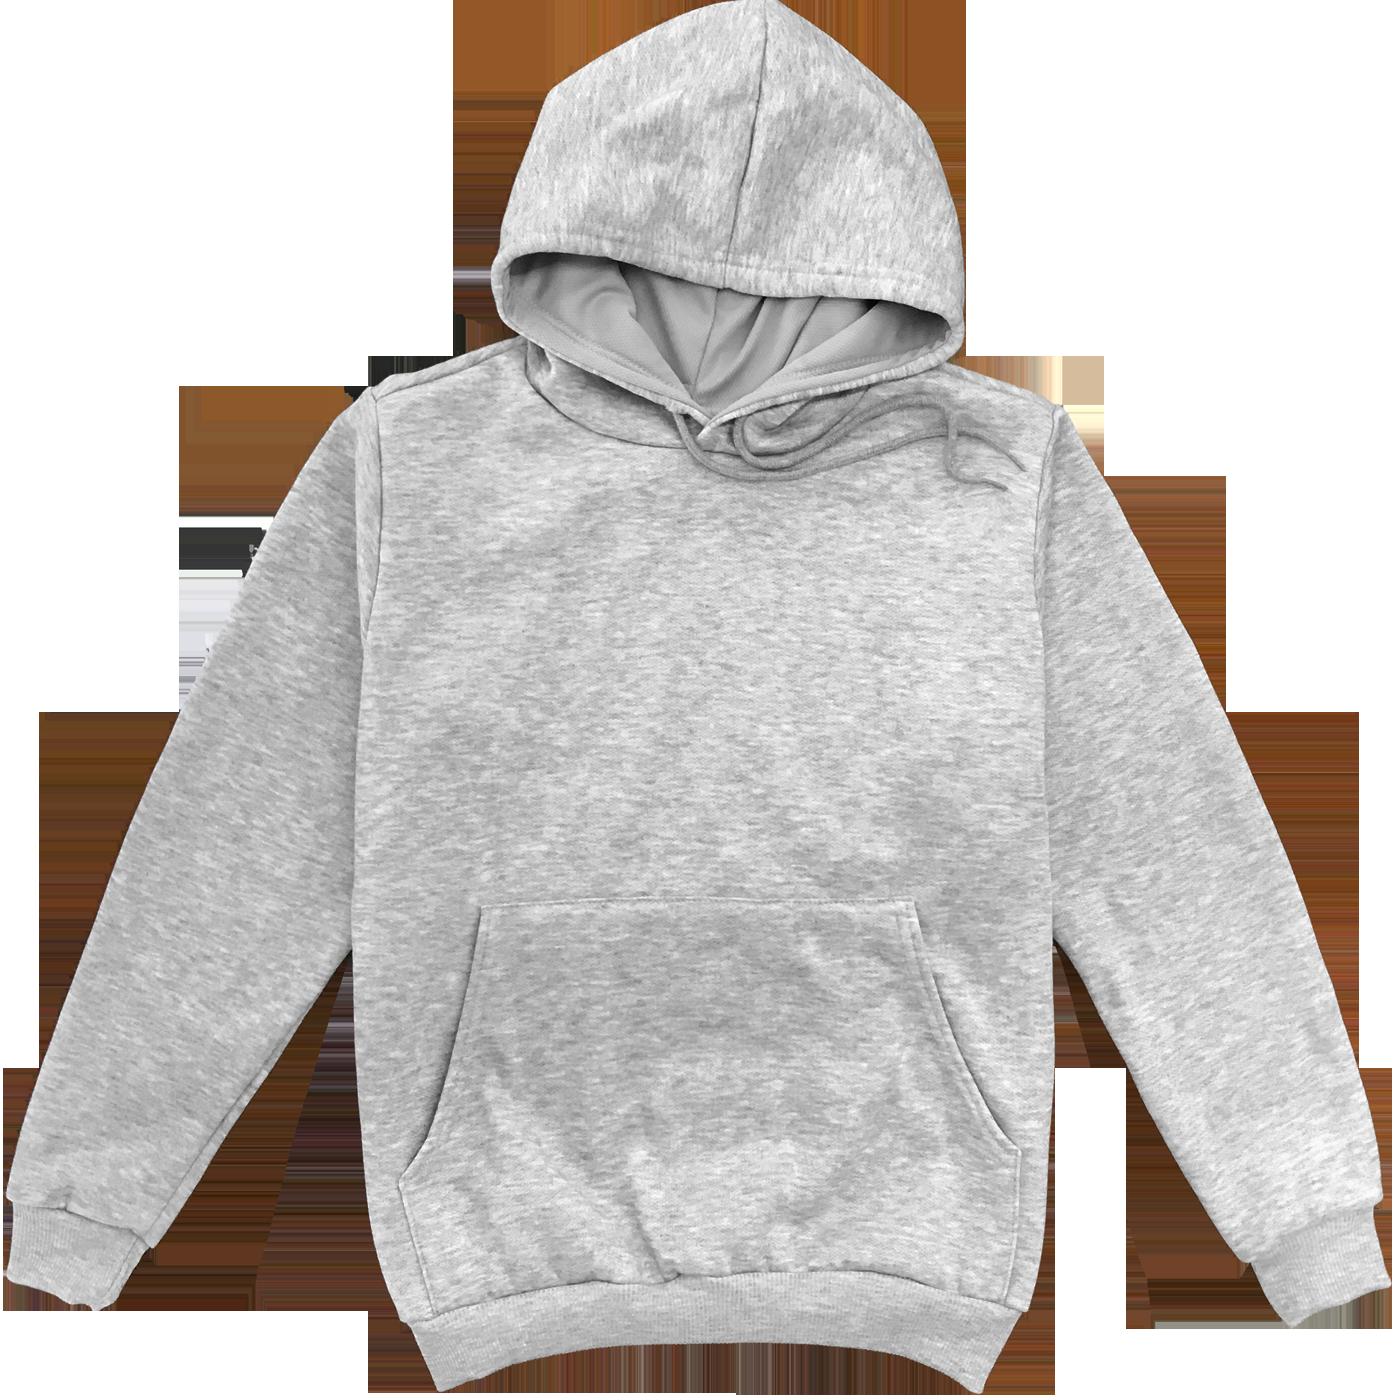 Sweatshirt clipart grey hoodie. Custom unisex sweat text